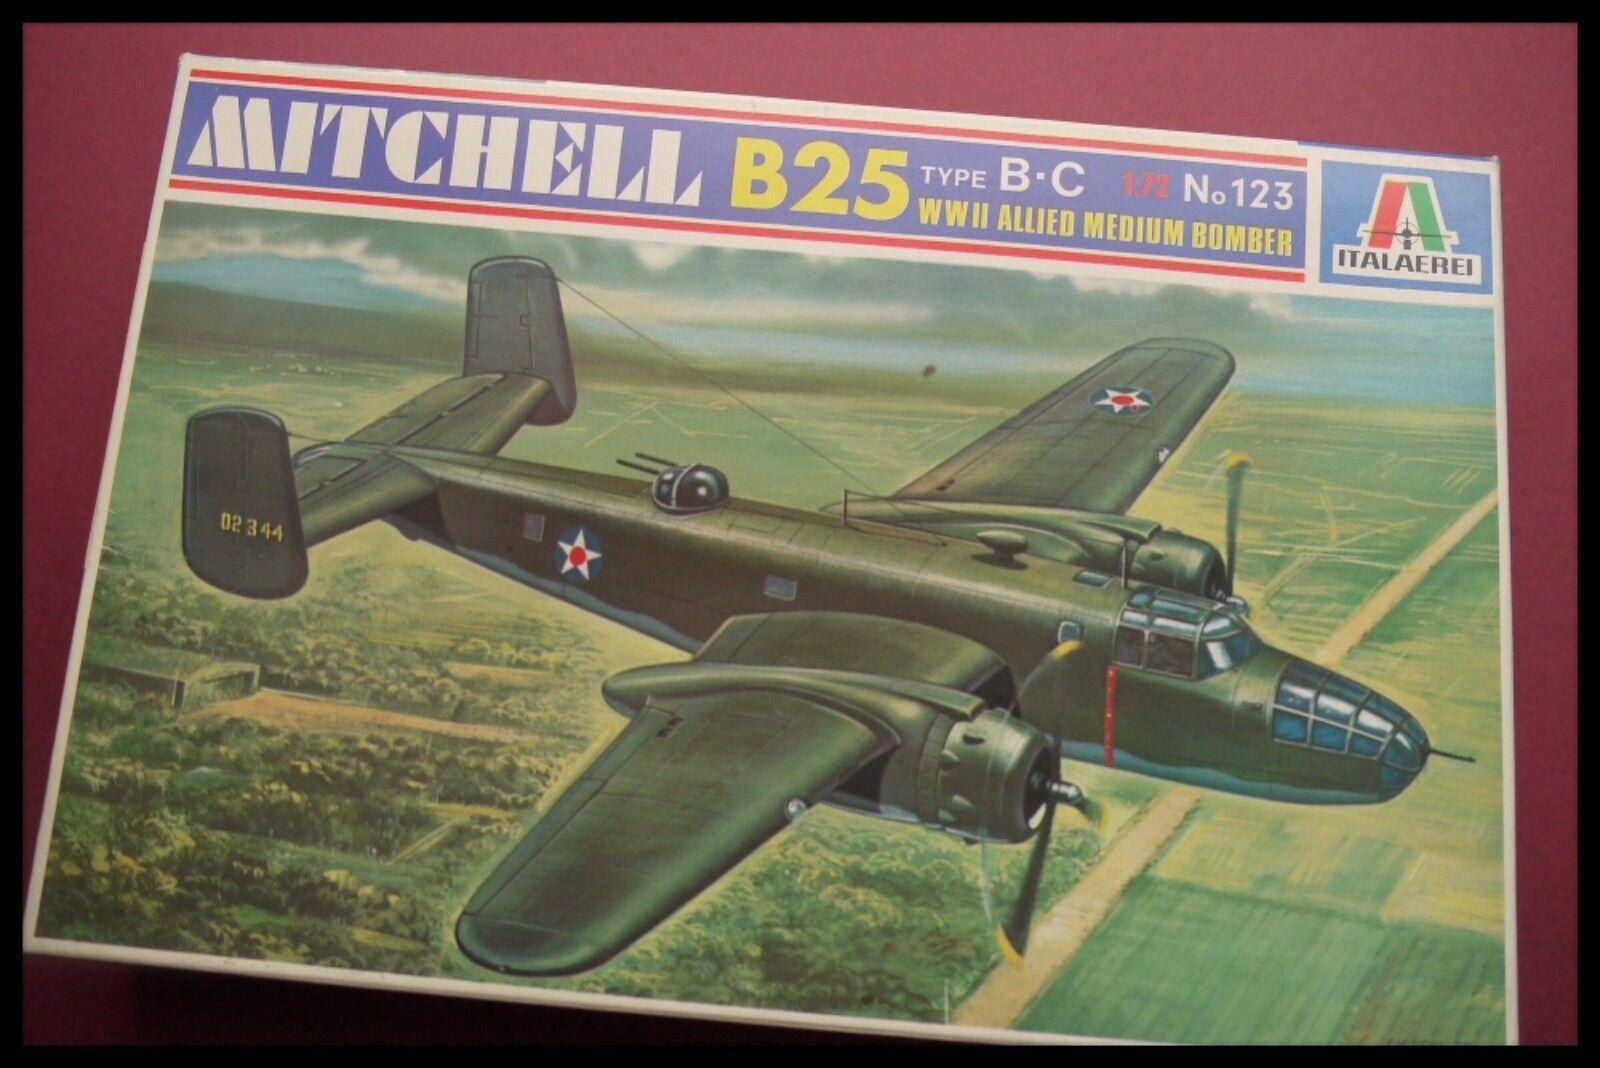 Italeri Italaerei 1 72 WWII Medium Bomber North American B-25 Mitchell Model Kit